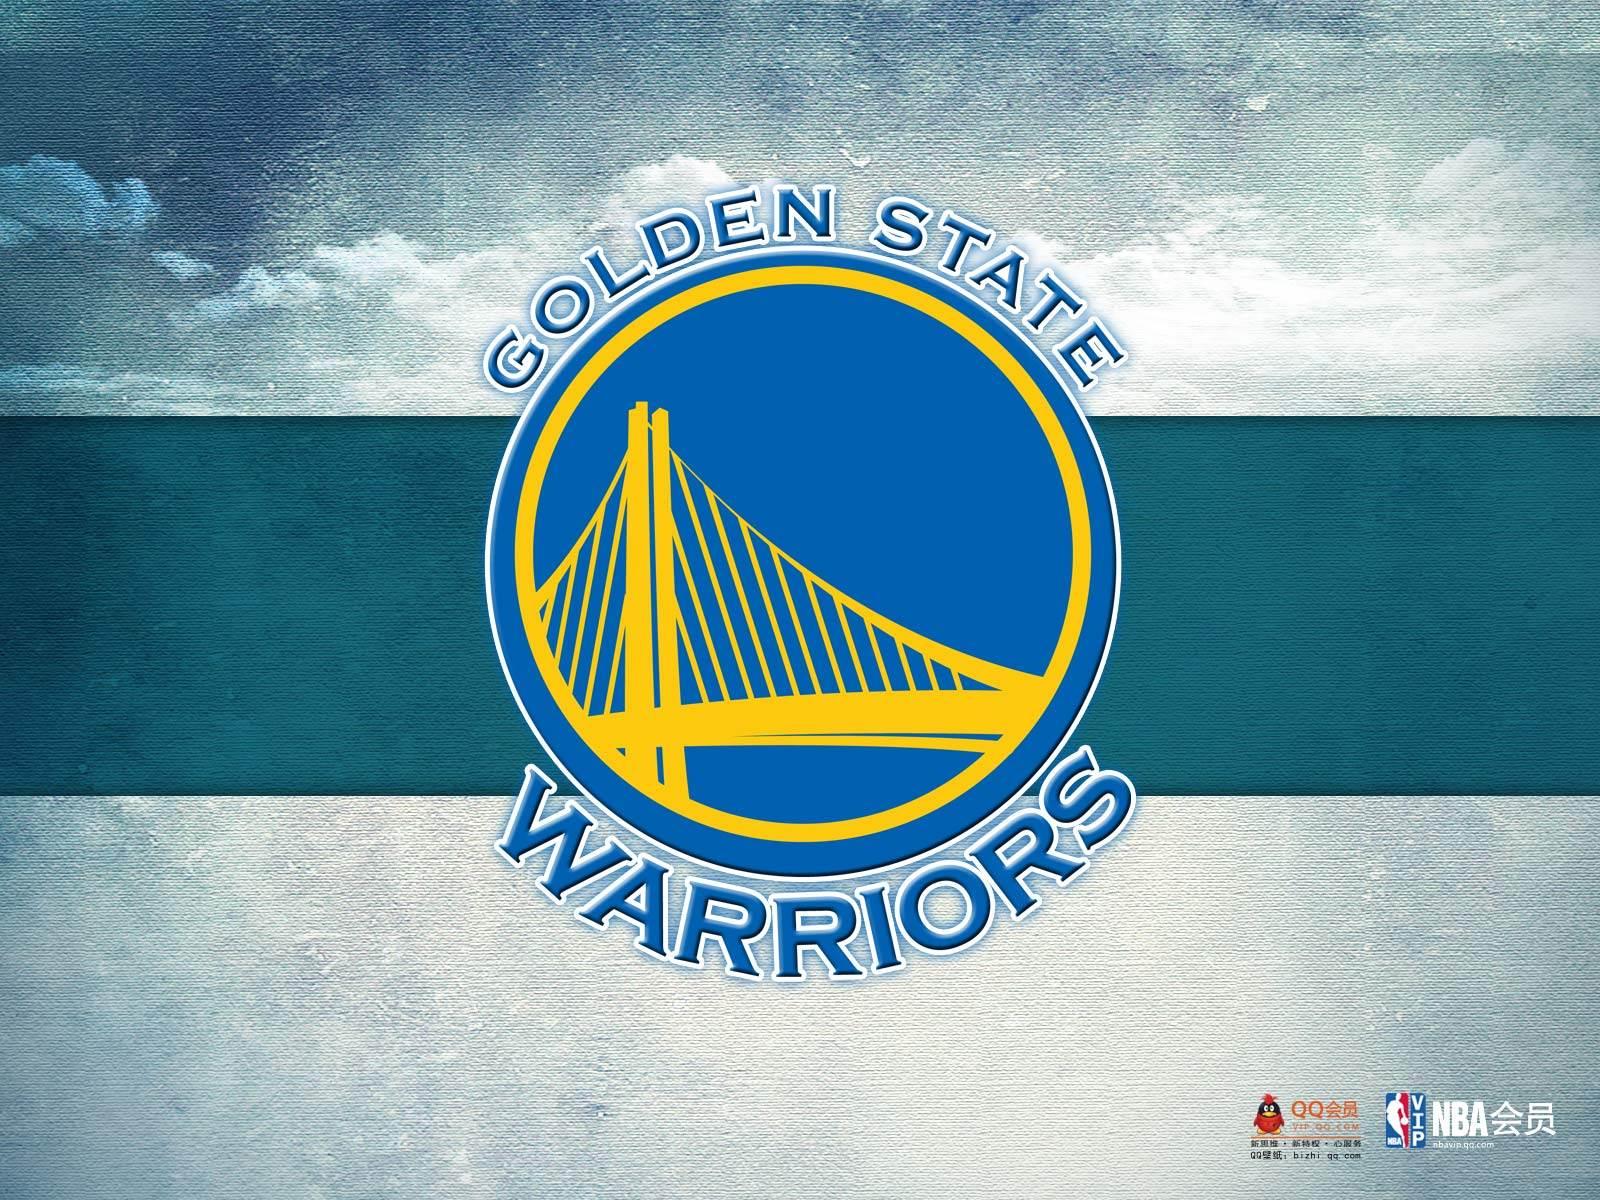 Wallpapers Backgrounds   Golden State Warriors Logo Desktop Wallpaper 1600x1200